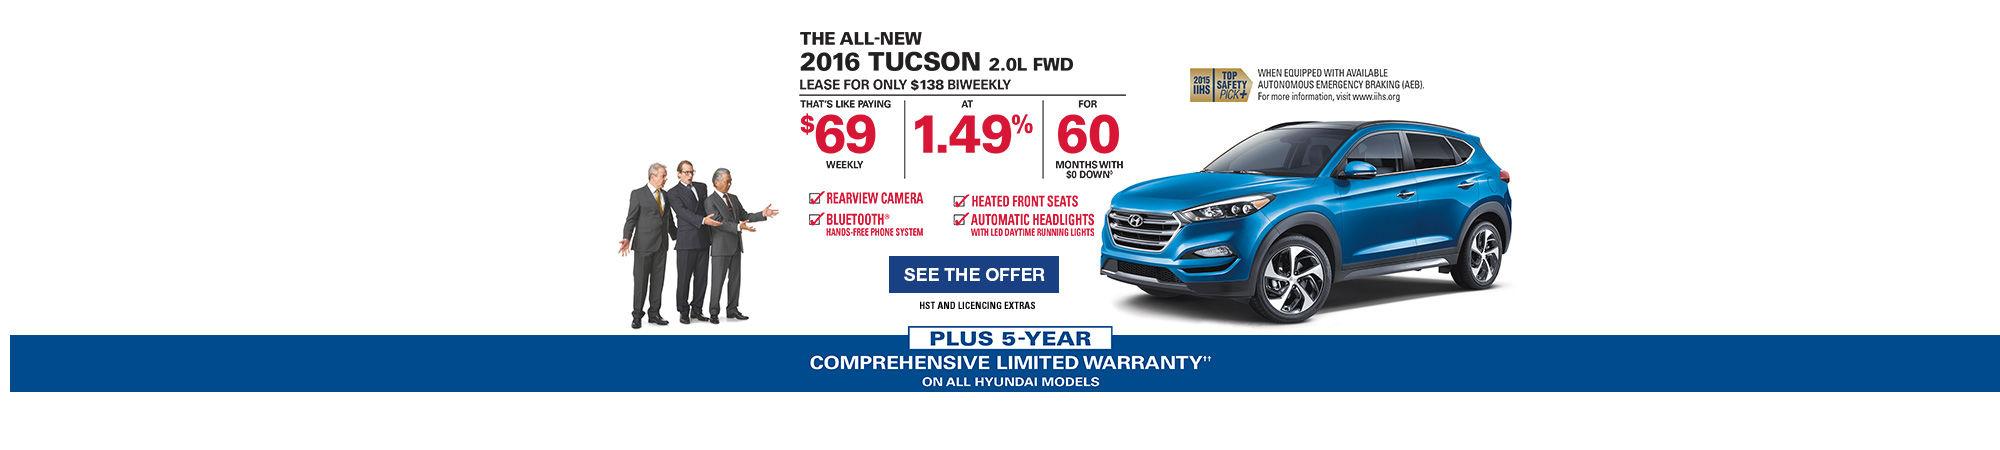 The Hyundai Advantage - Tucson